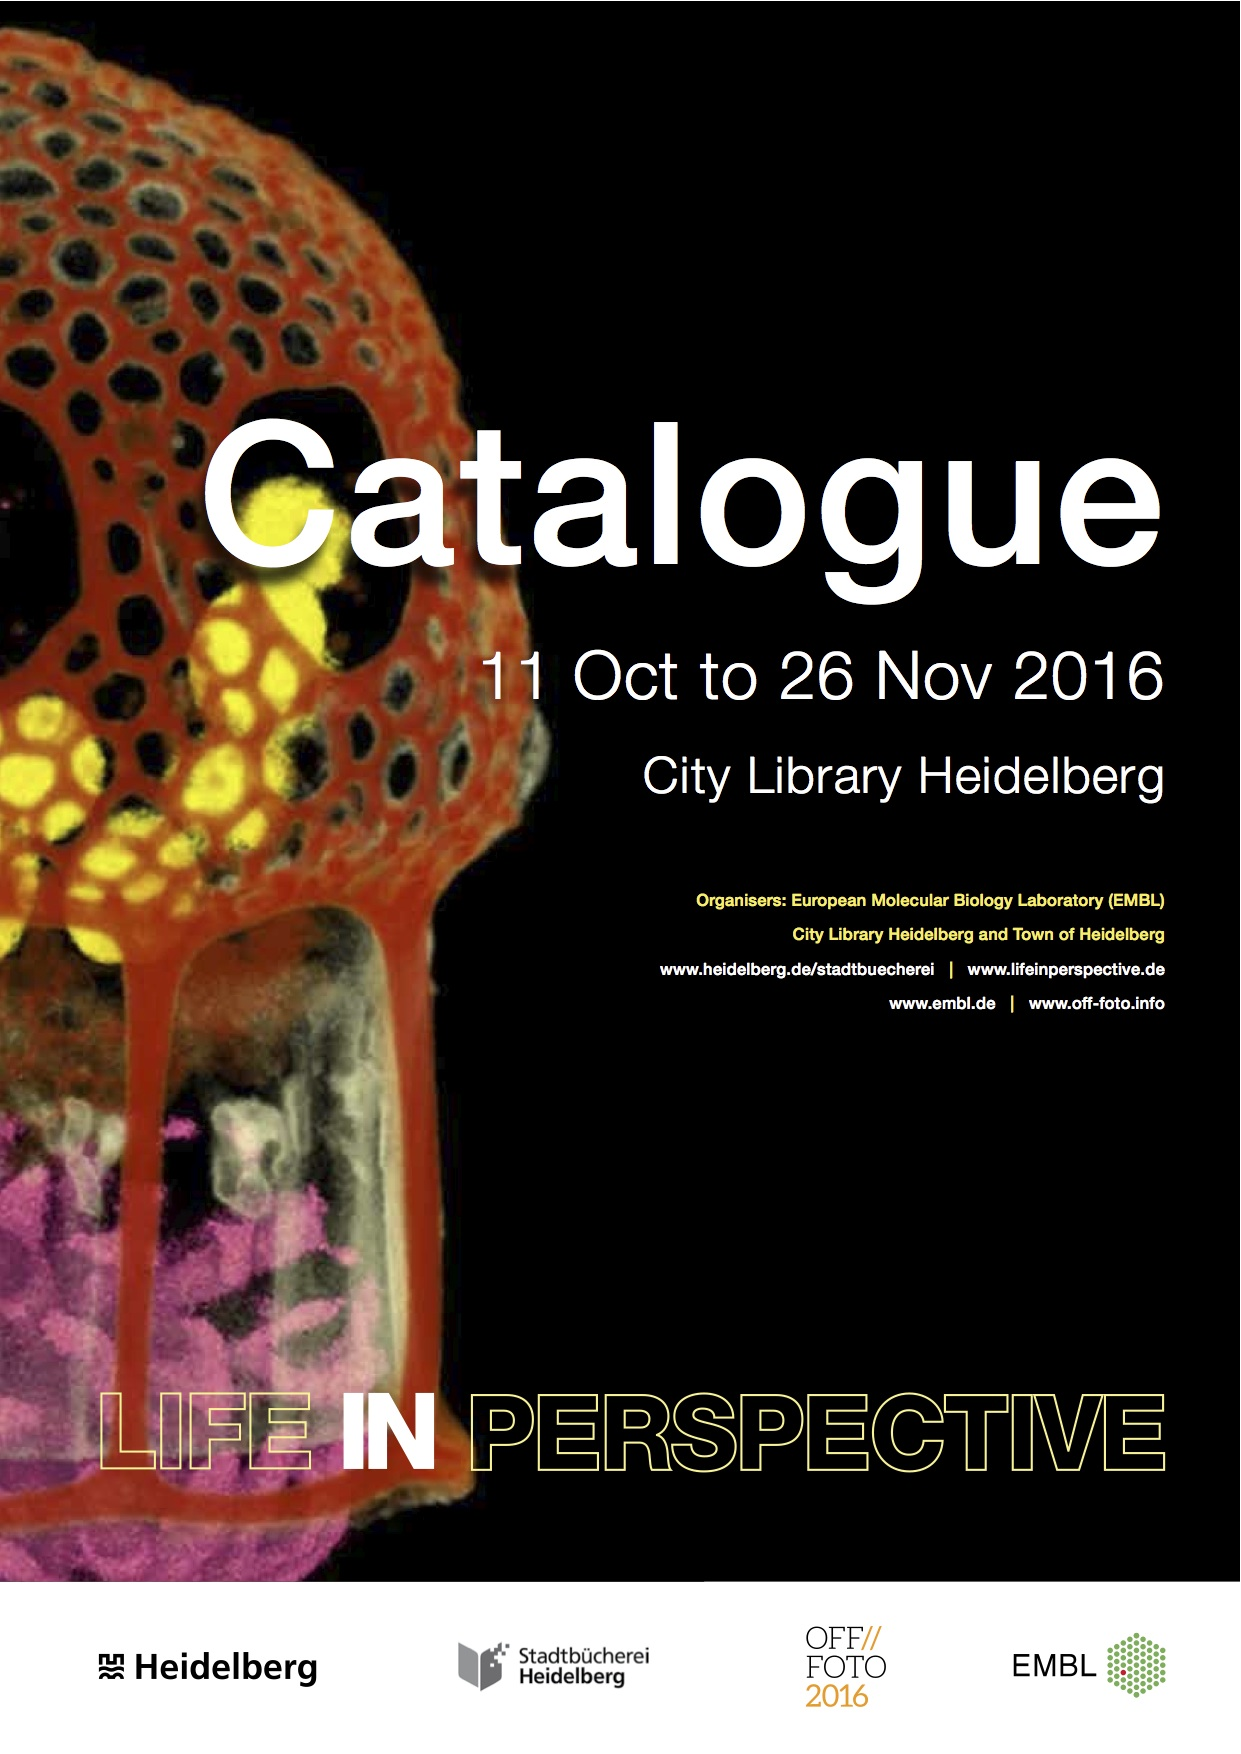 Catalogue poster